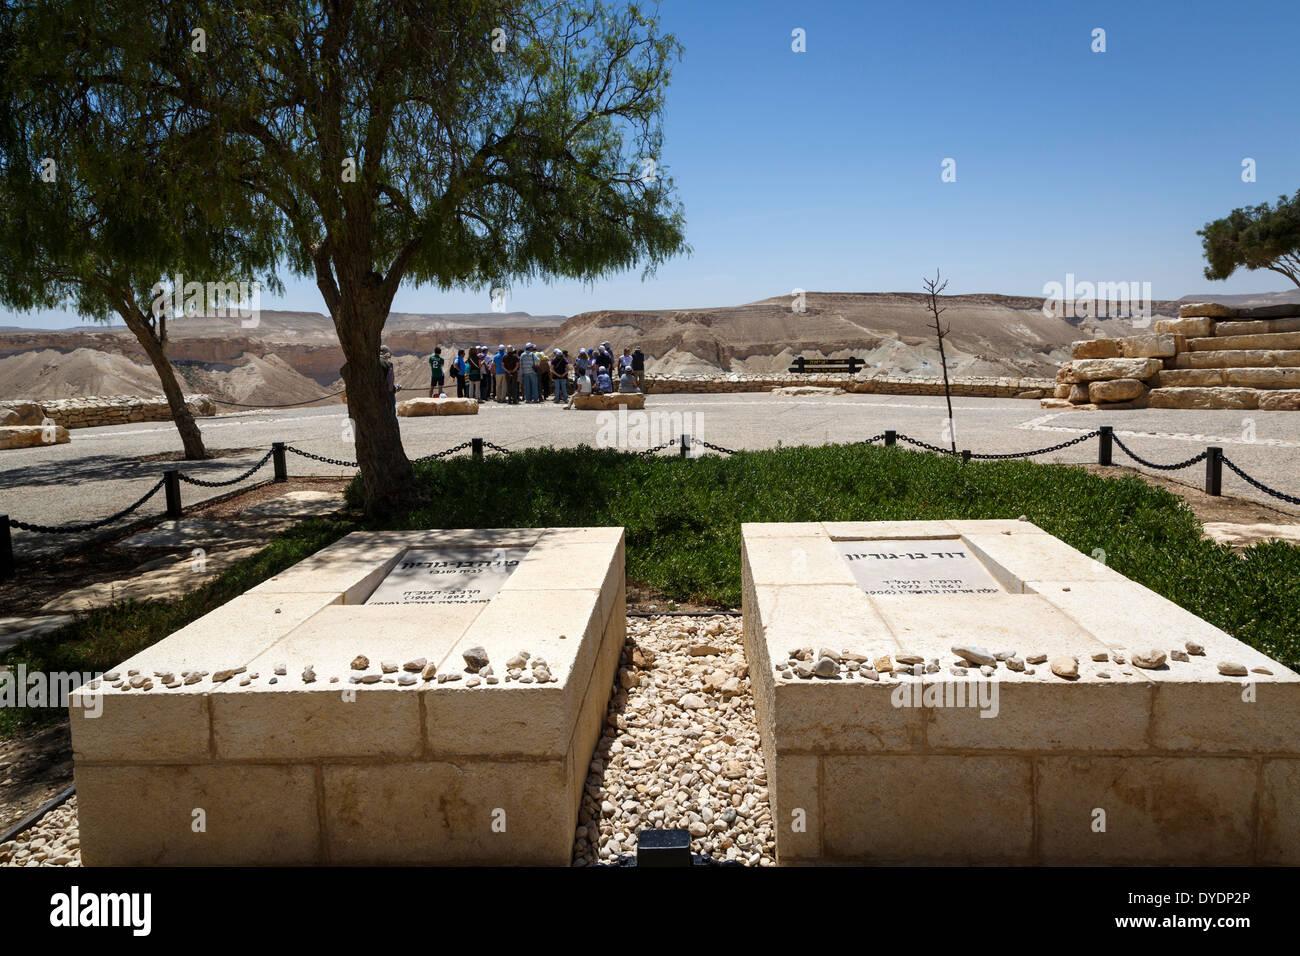 The grave site of David Ben Gurion in Sde Boker, Negev region, Israel. - Stock Image